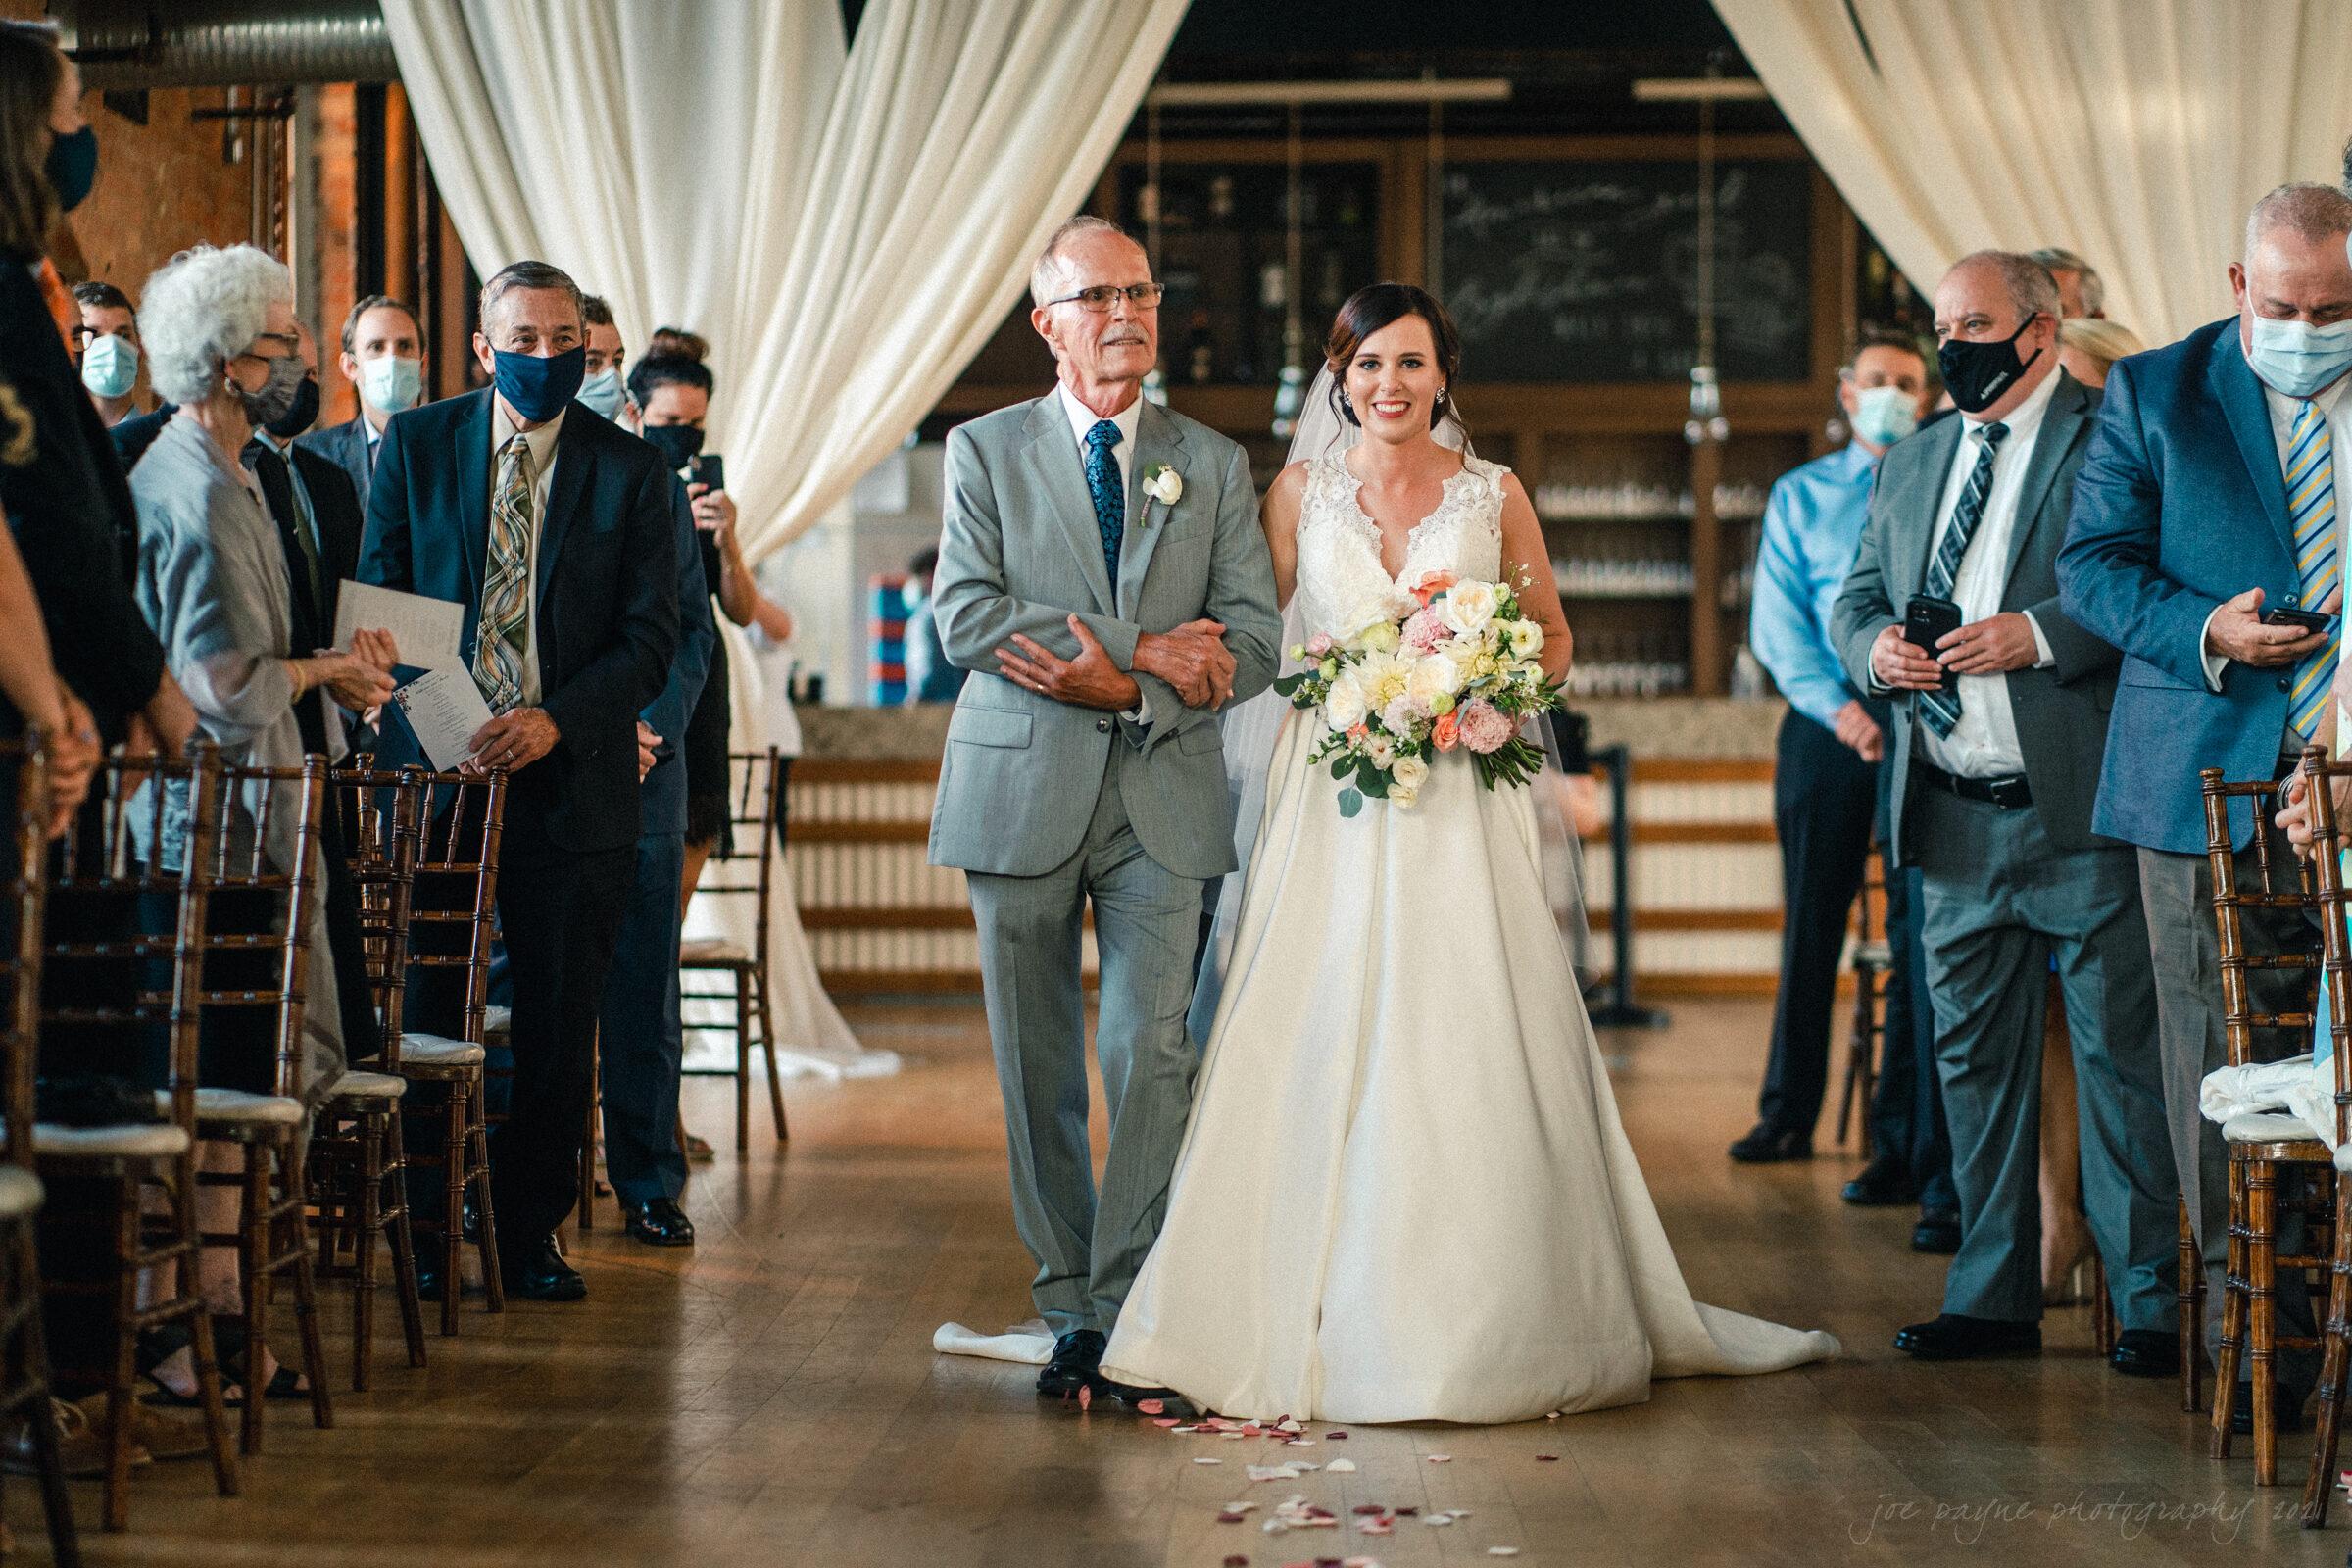 Cotton Room Wedding Photographer Kate Martin 25